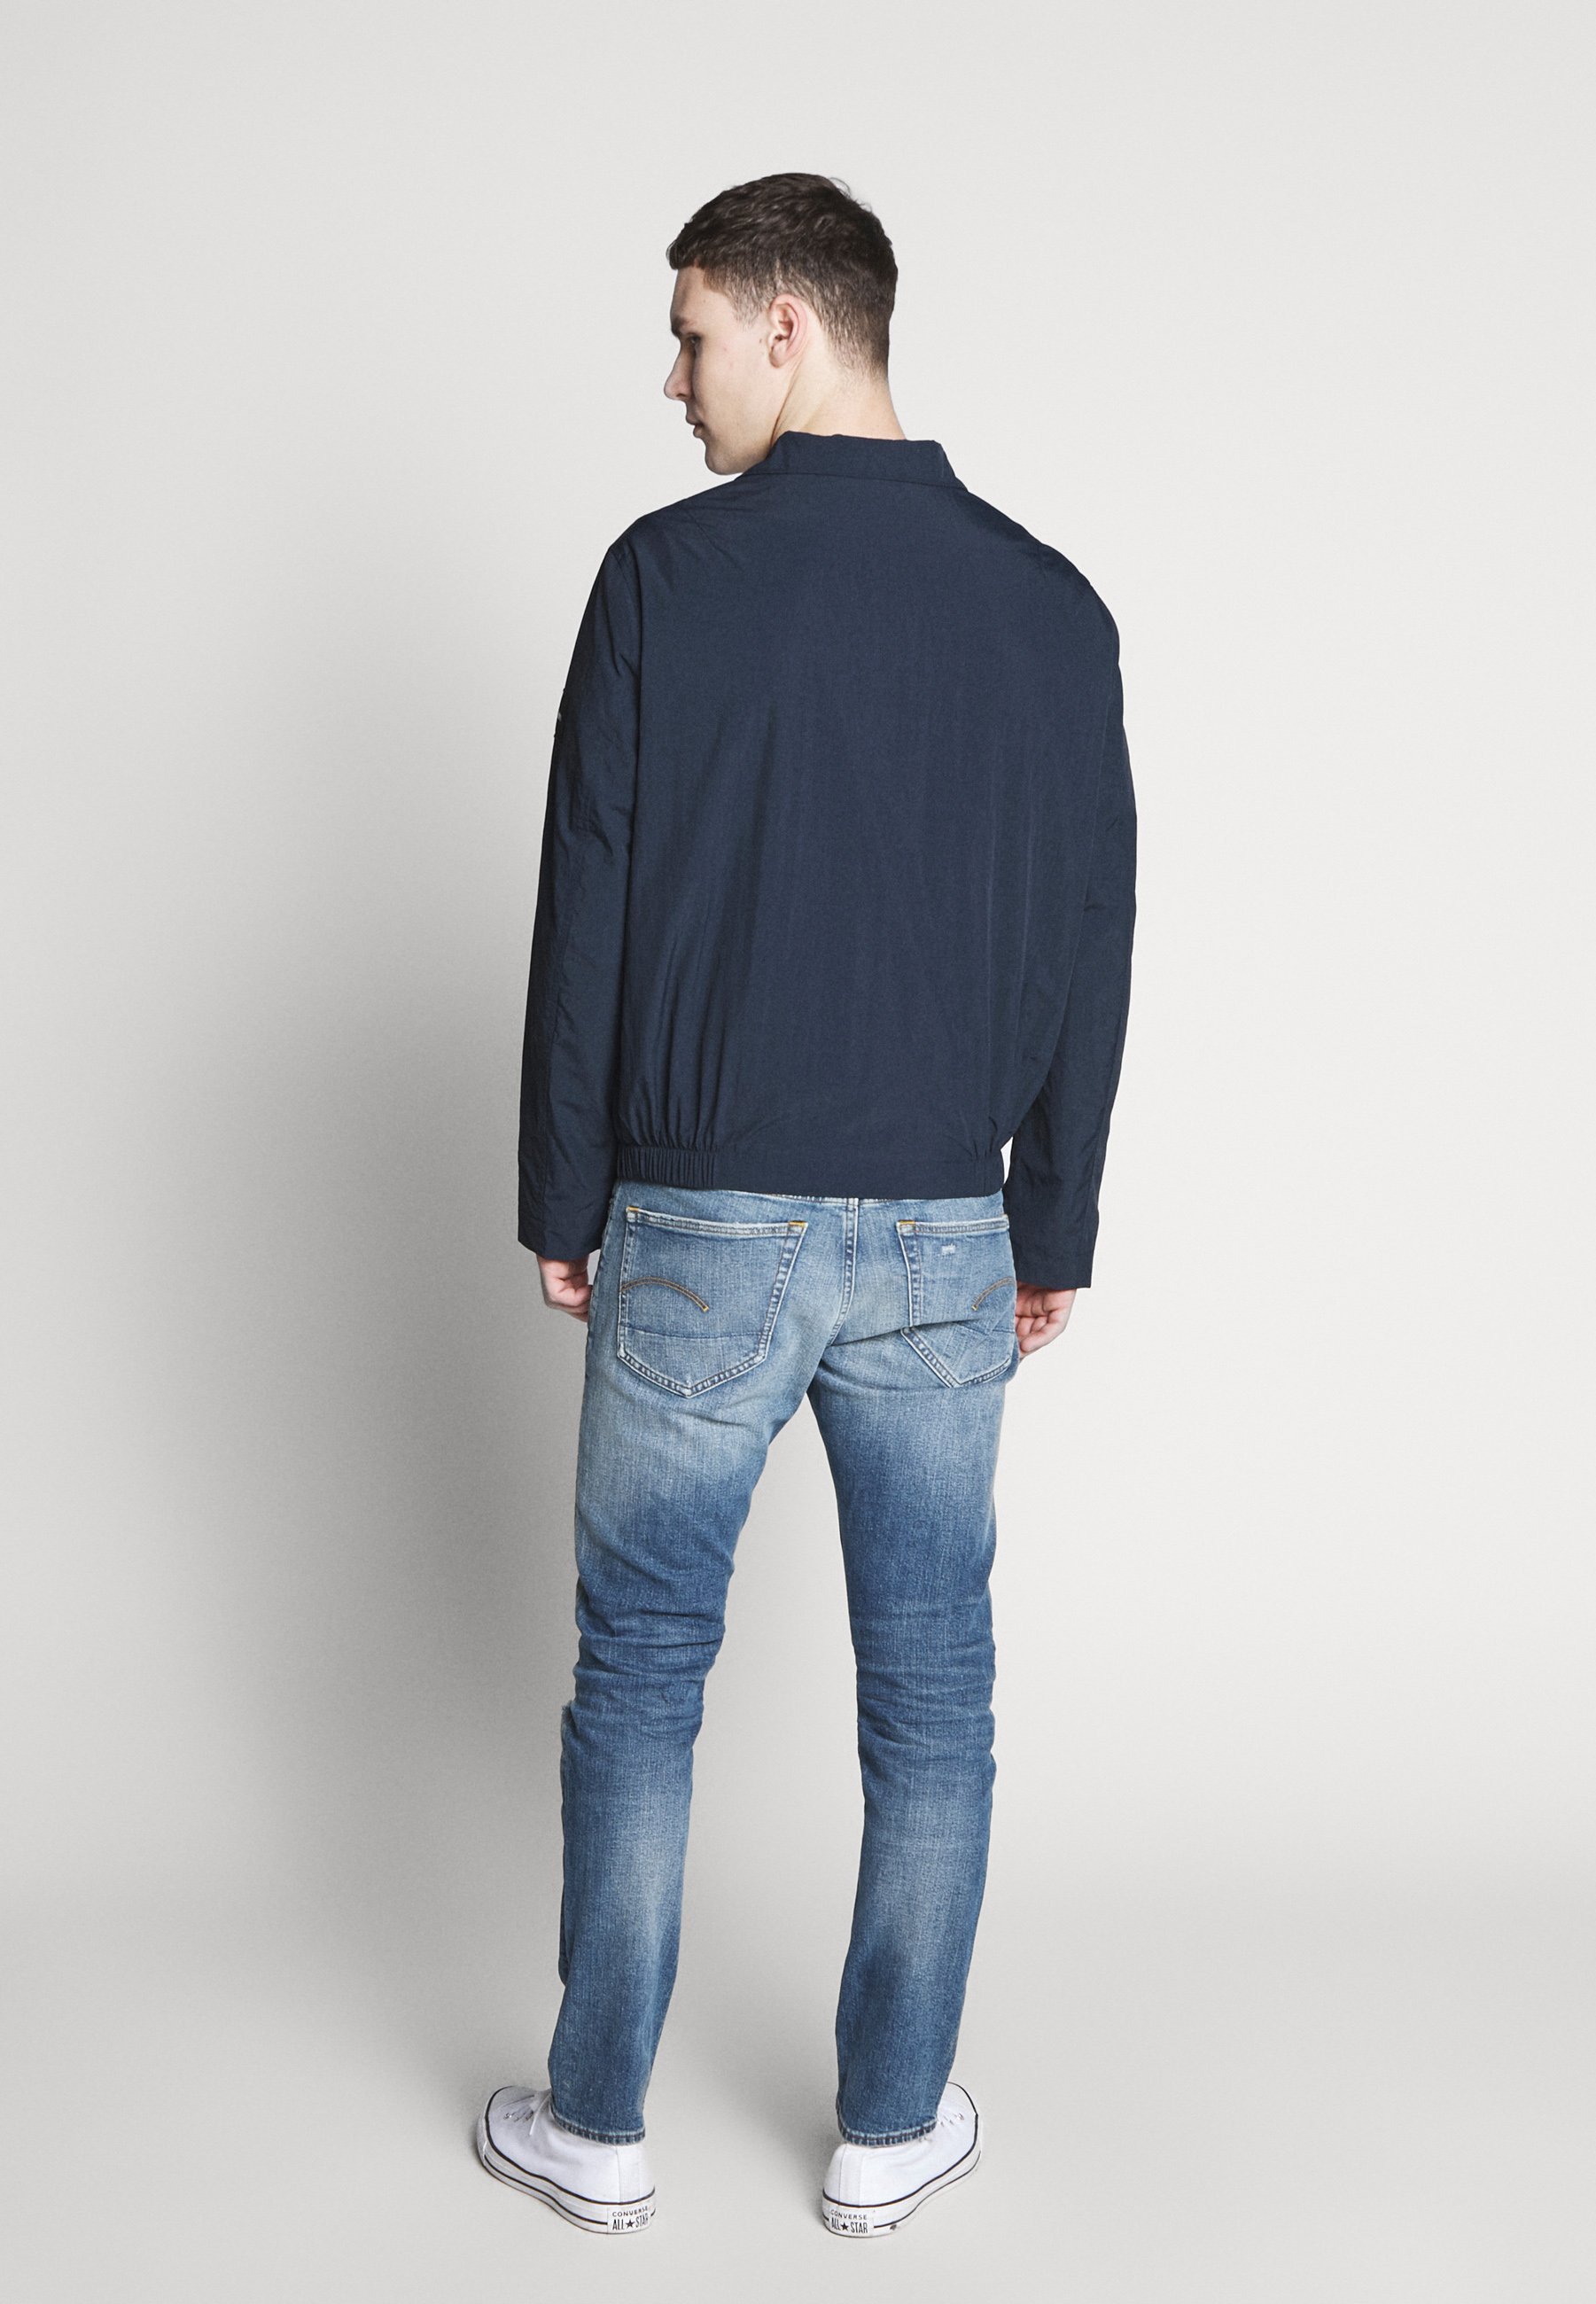 Online Miesten vaatteet Sarja dfKJIUp97454sfGHYHD Calvin Klein CRINKLE BLOUSON JACKET Kevyt takki blue